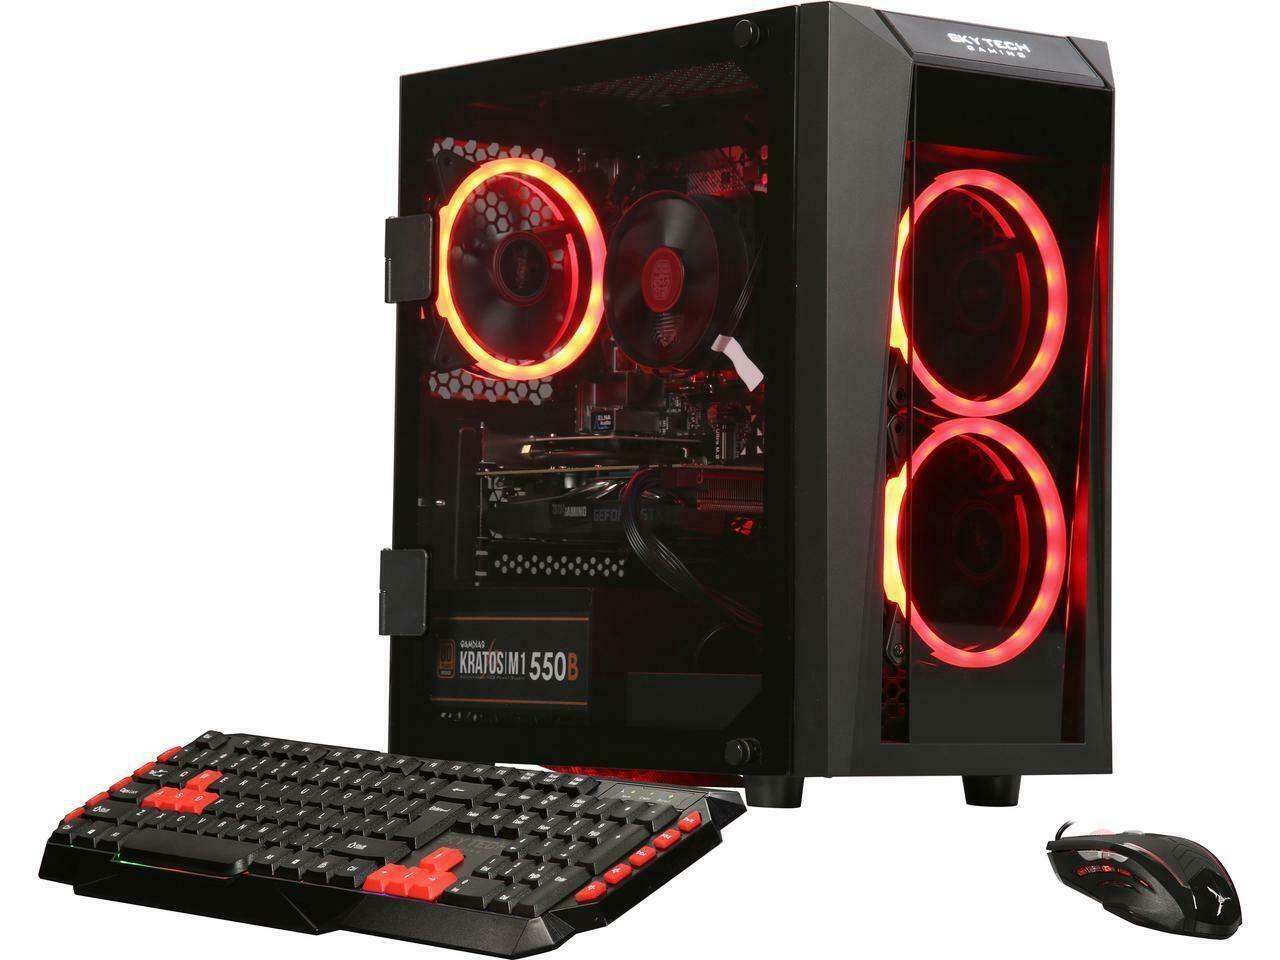 Skytech Blaze Ii Gaming Pc Nvidia Geforce Gtx 1660 Ryzen 5 2600 6 Core 3 40 Ghz The Electronic Spot Gaming Pc Nvidia Affordable Gaming Pc